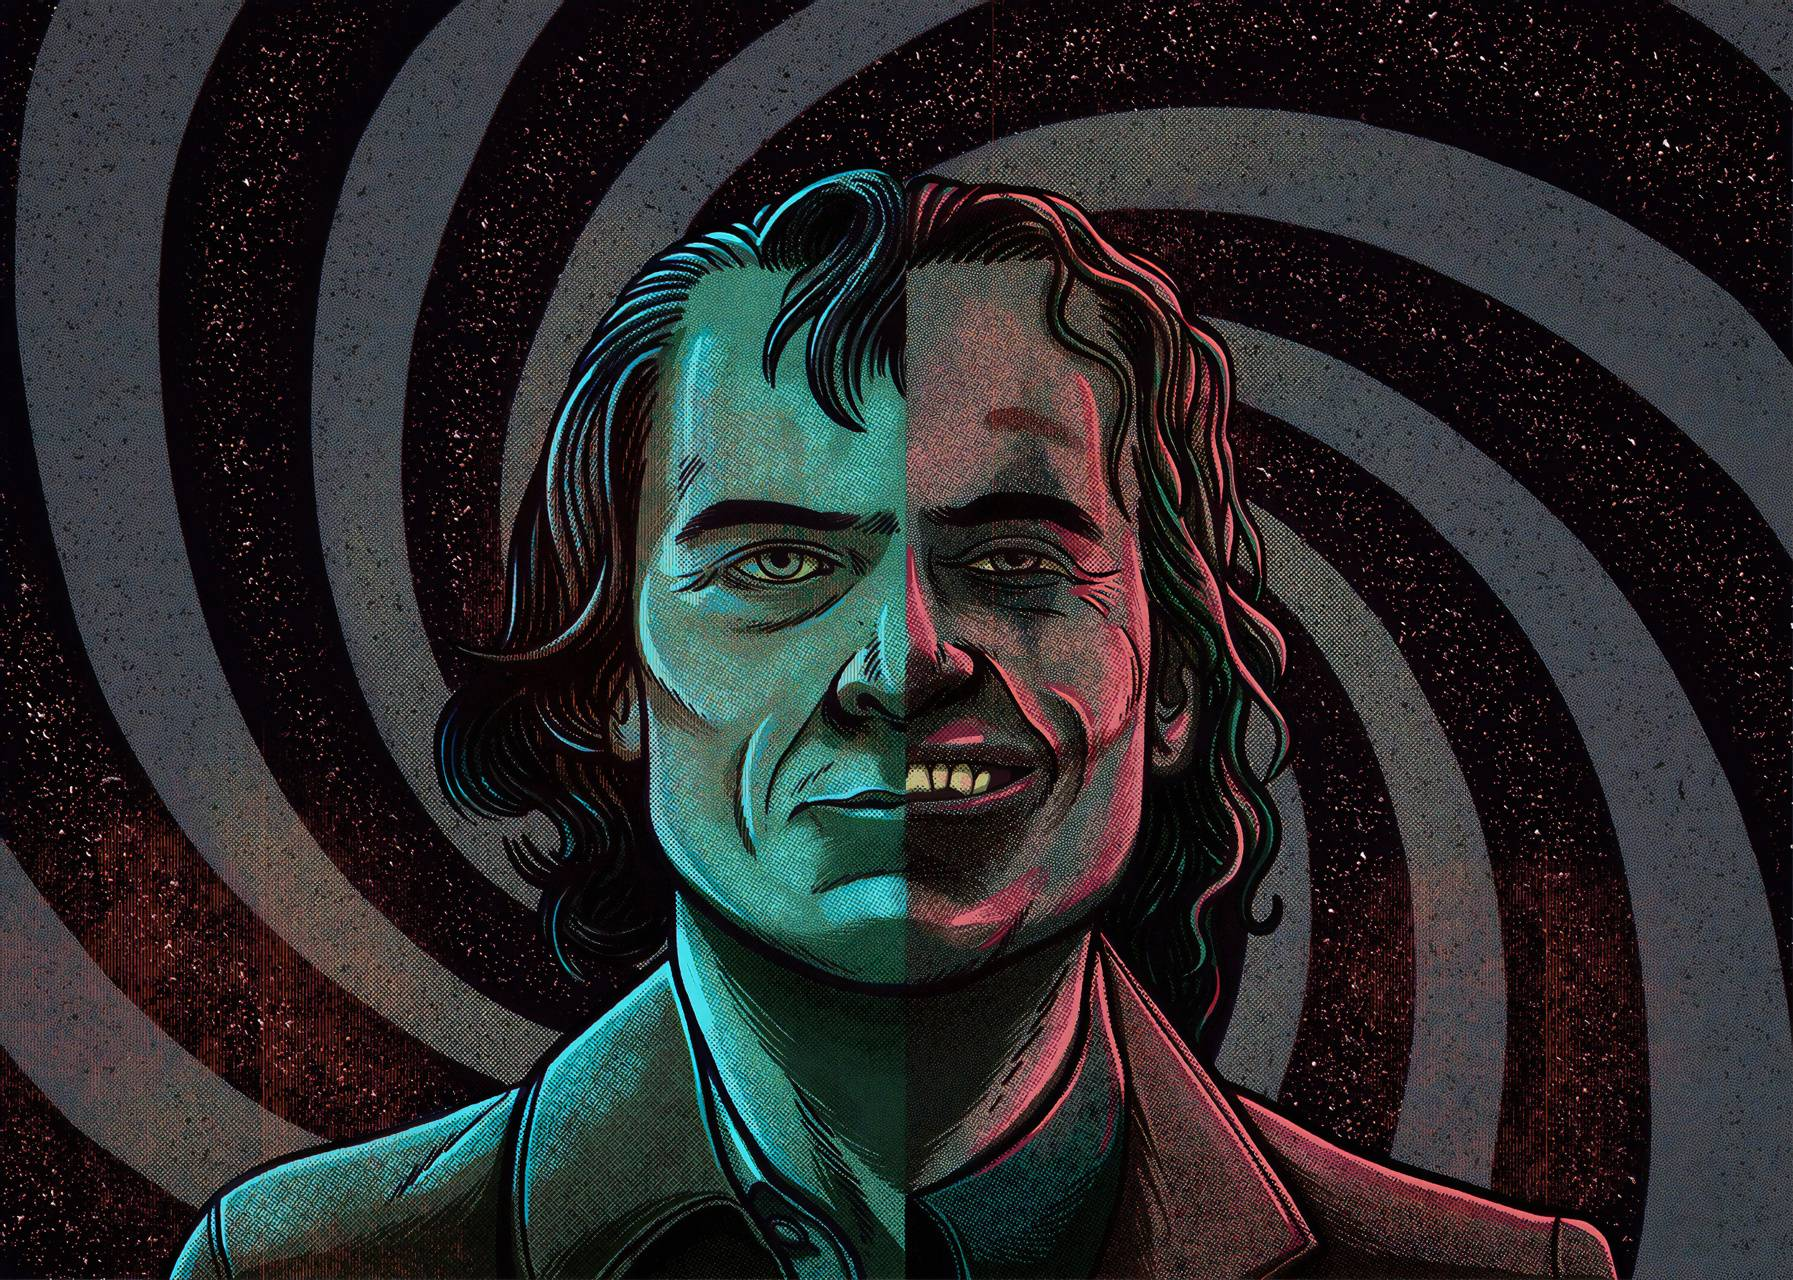 Joker Goo Bad Wallpaper By U T M19 Cc Free On Zedge